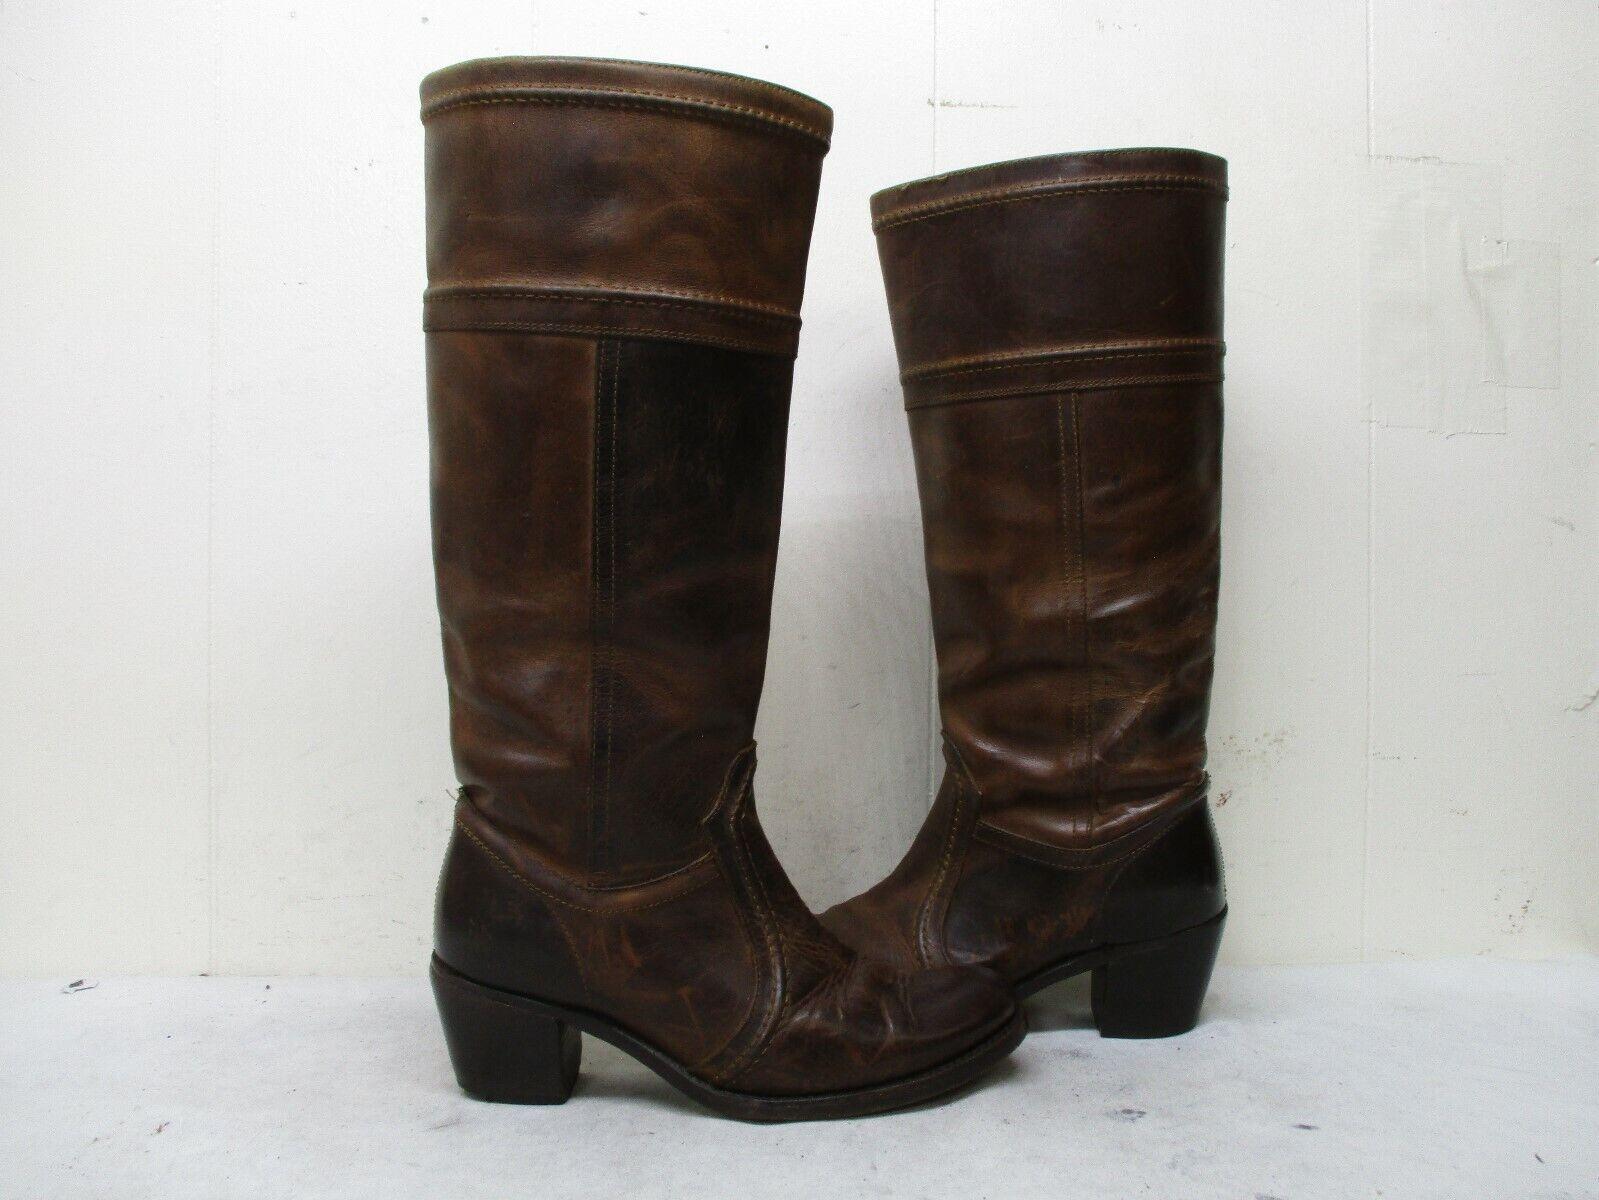 Frye Marronee Leather Knee High stivali donna Dimensione 8.5 B Style 77219